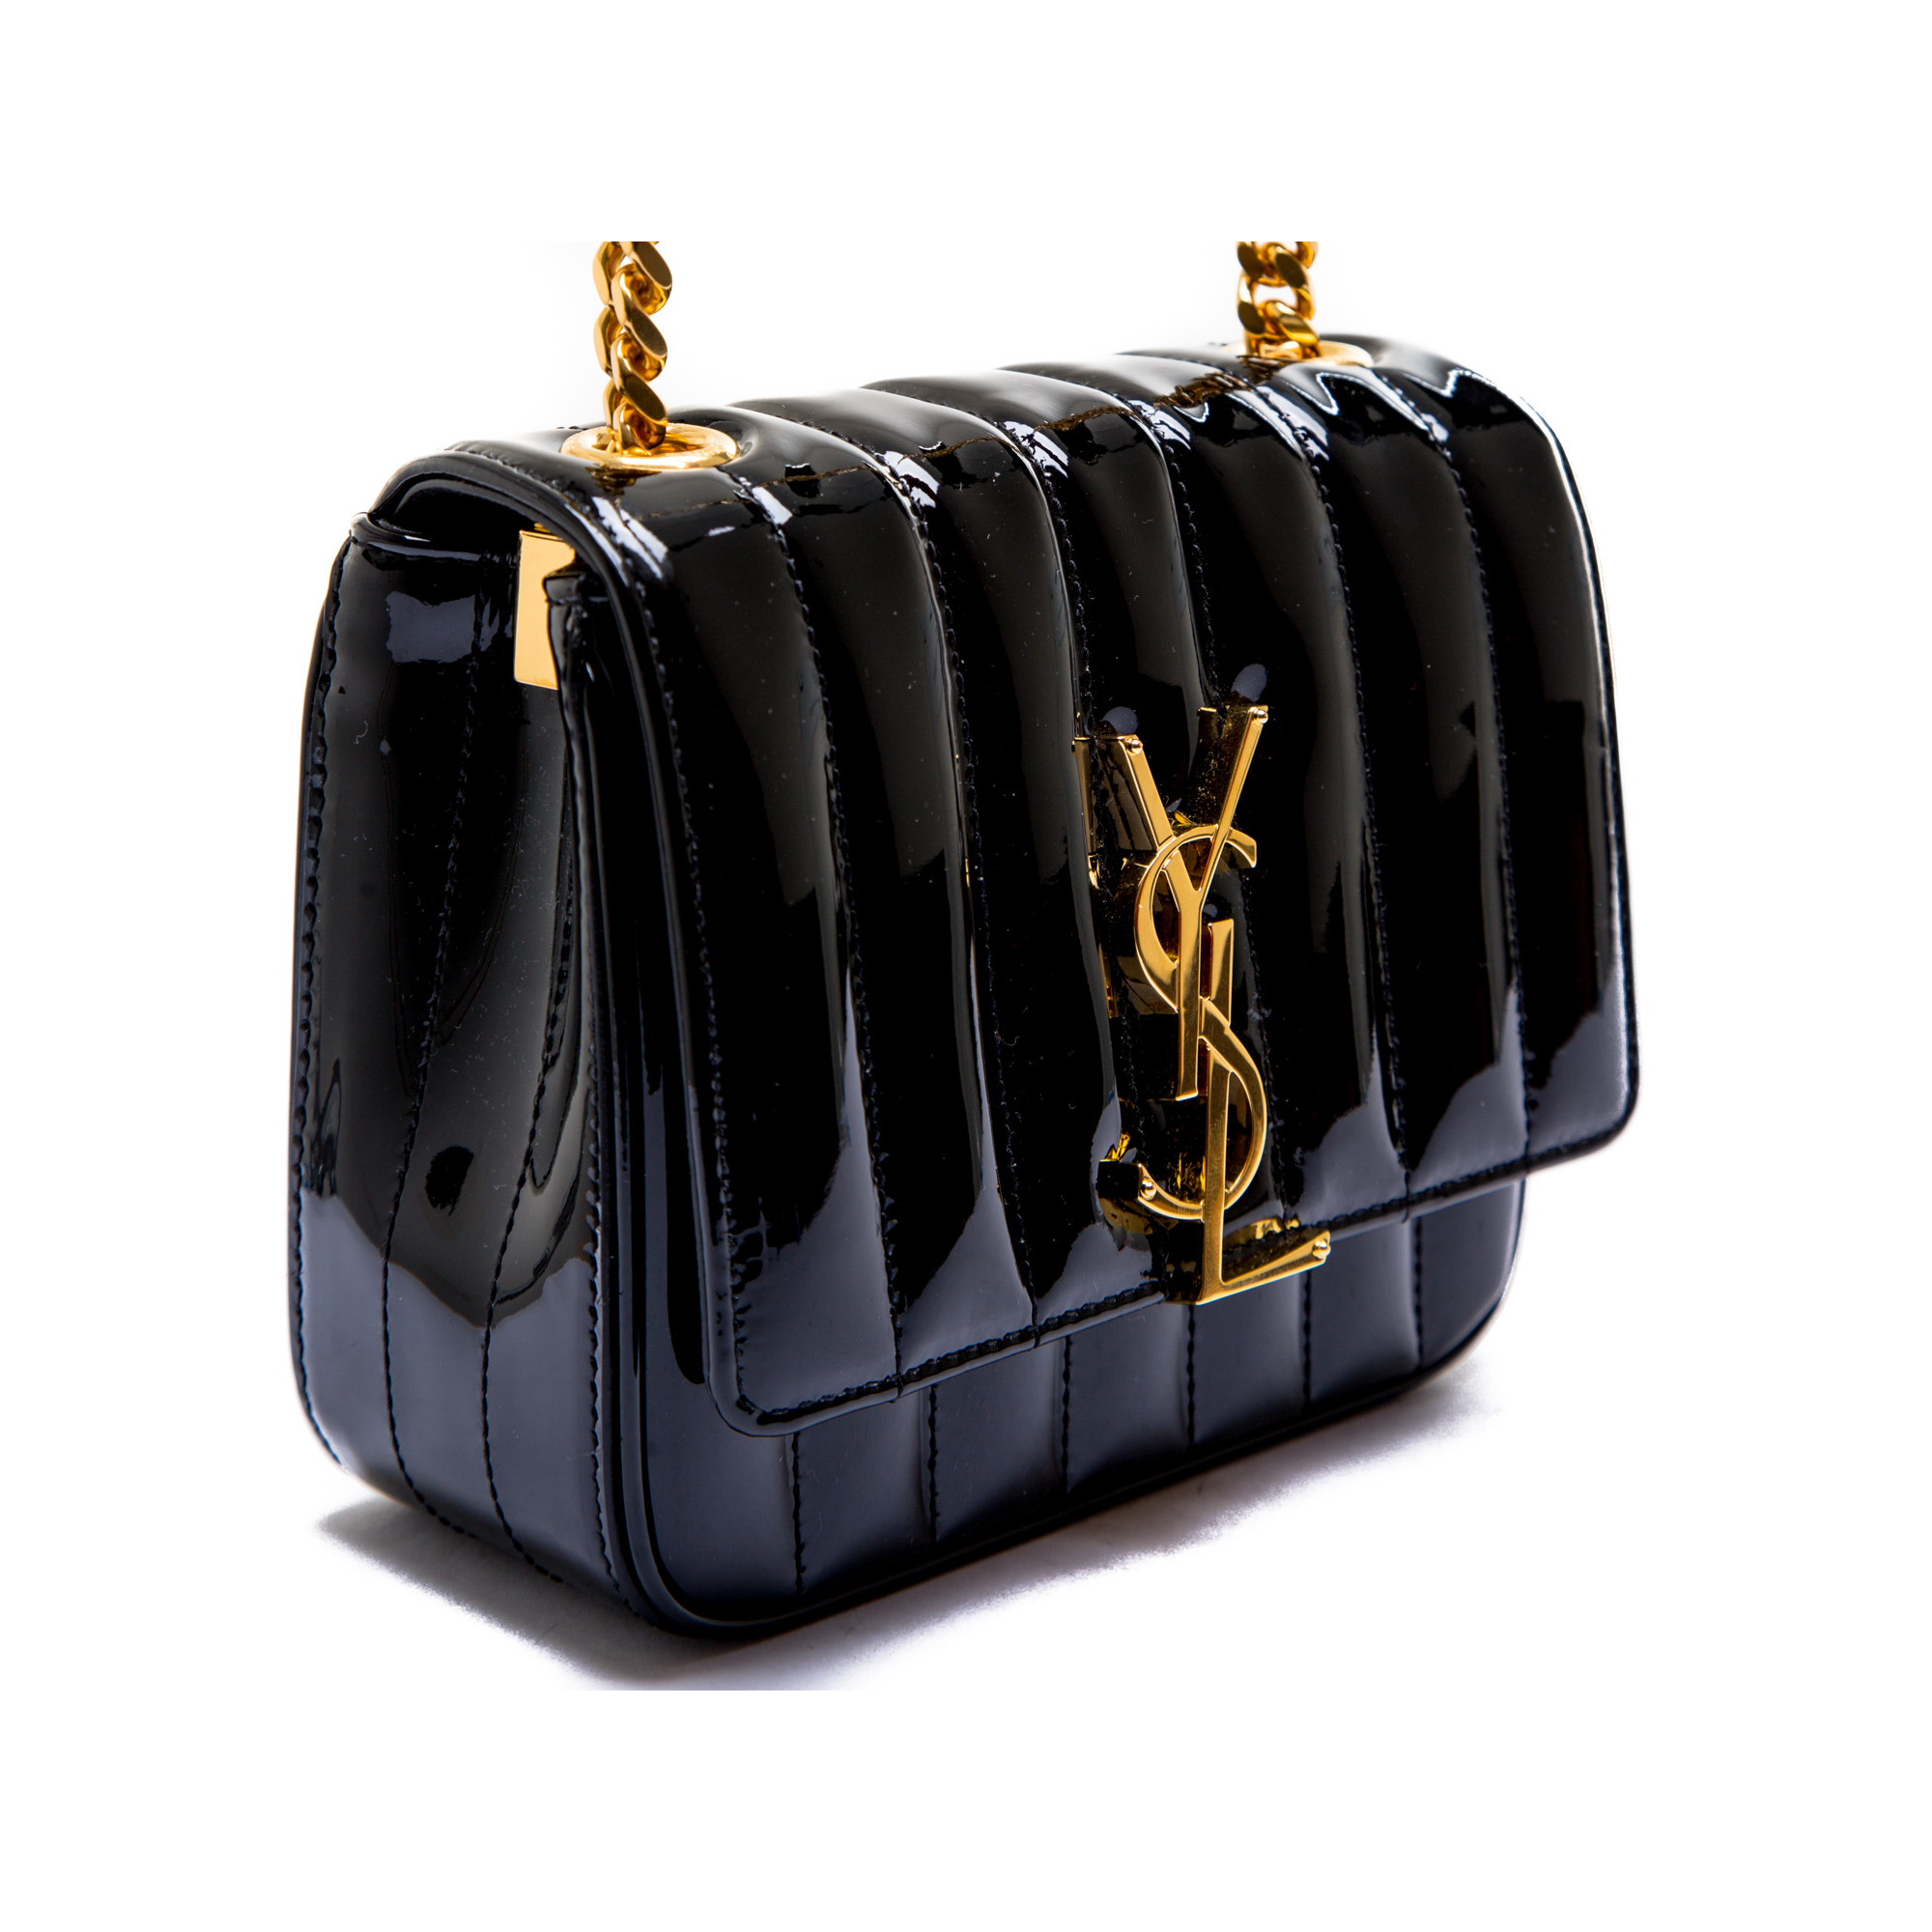 ... Saint Laurent ysl bag mng vicky s black Saint Laurent ysl bag mng vicky  s black 552adffa81139